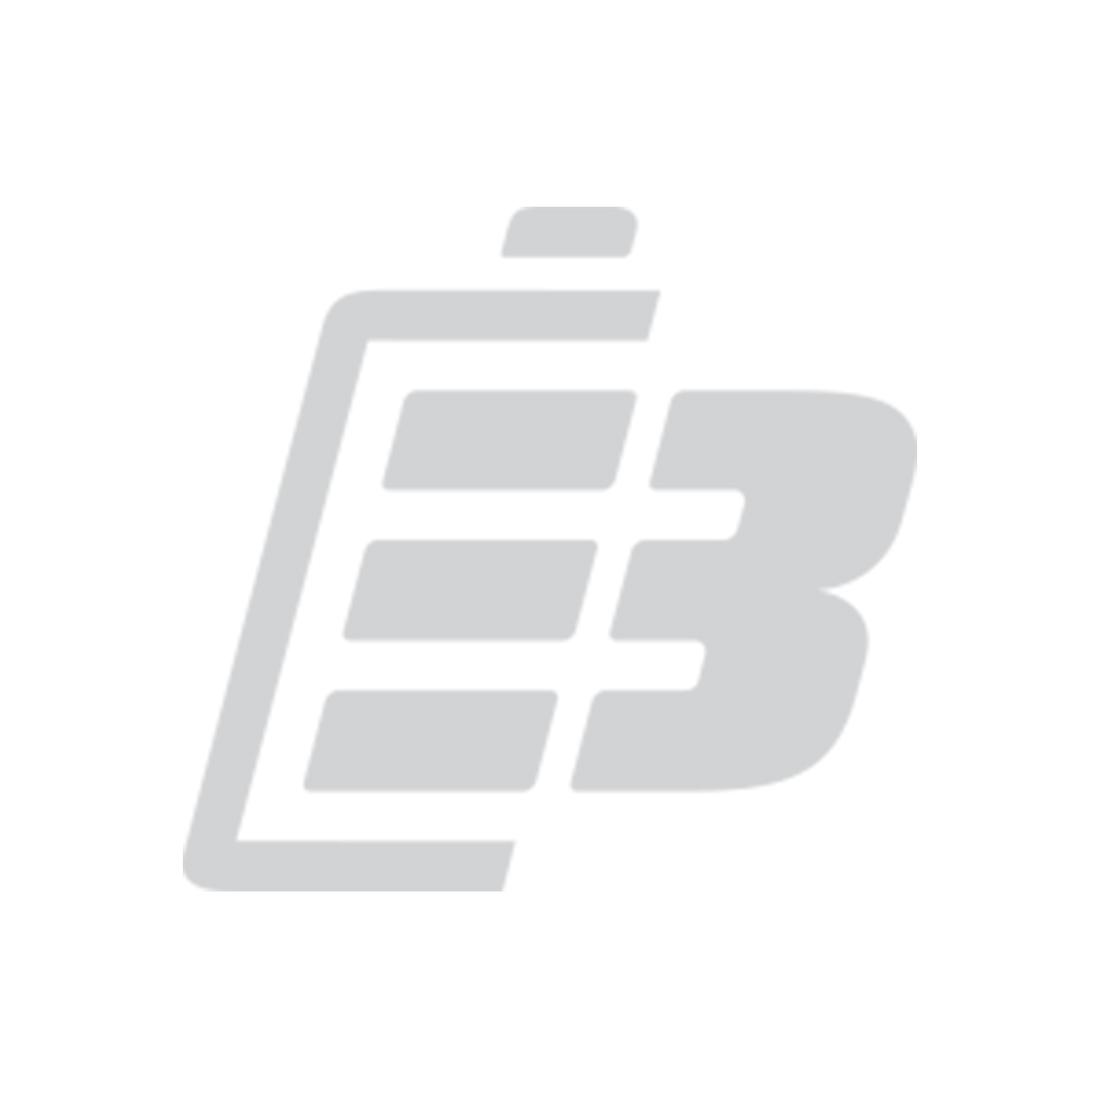 Duracell ActiveAir DA 675